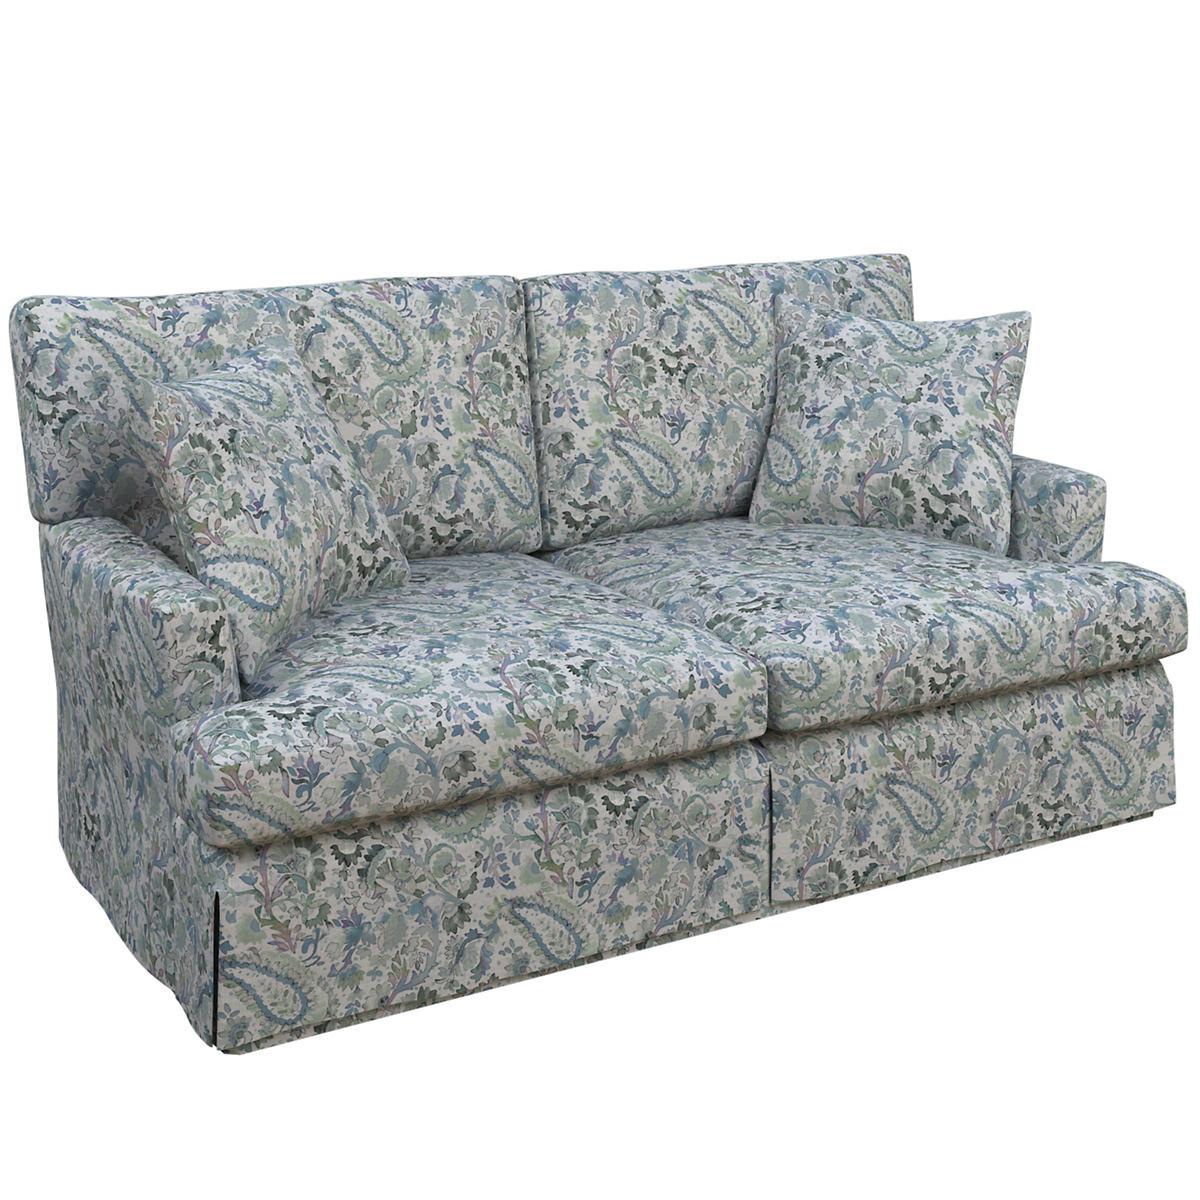 Ines Linen Blue Saybrook 2 Seater Sofa